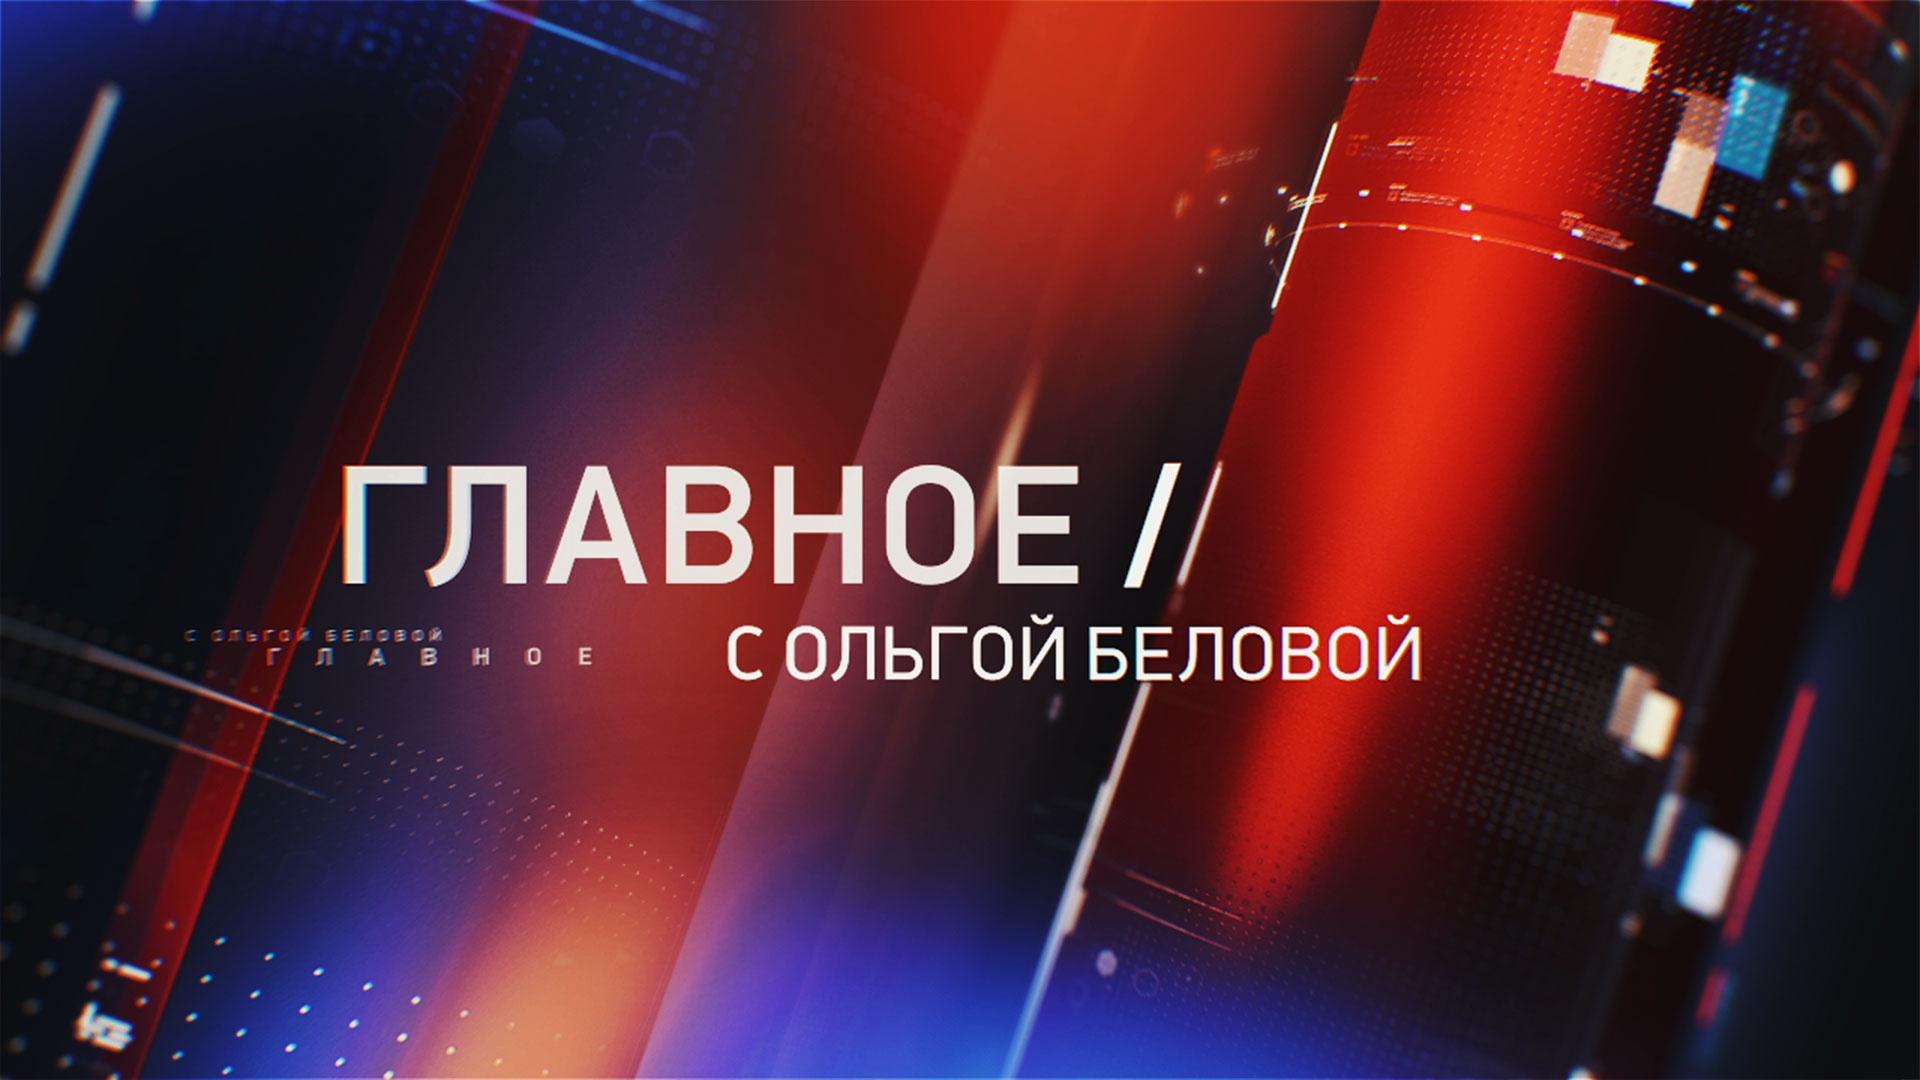 https://mcdn.tvzvezda.ru/storage/news_other_images/2021/03/29/df3c8314aa6c4a7297090ef3ce25e159.jpg